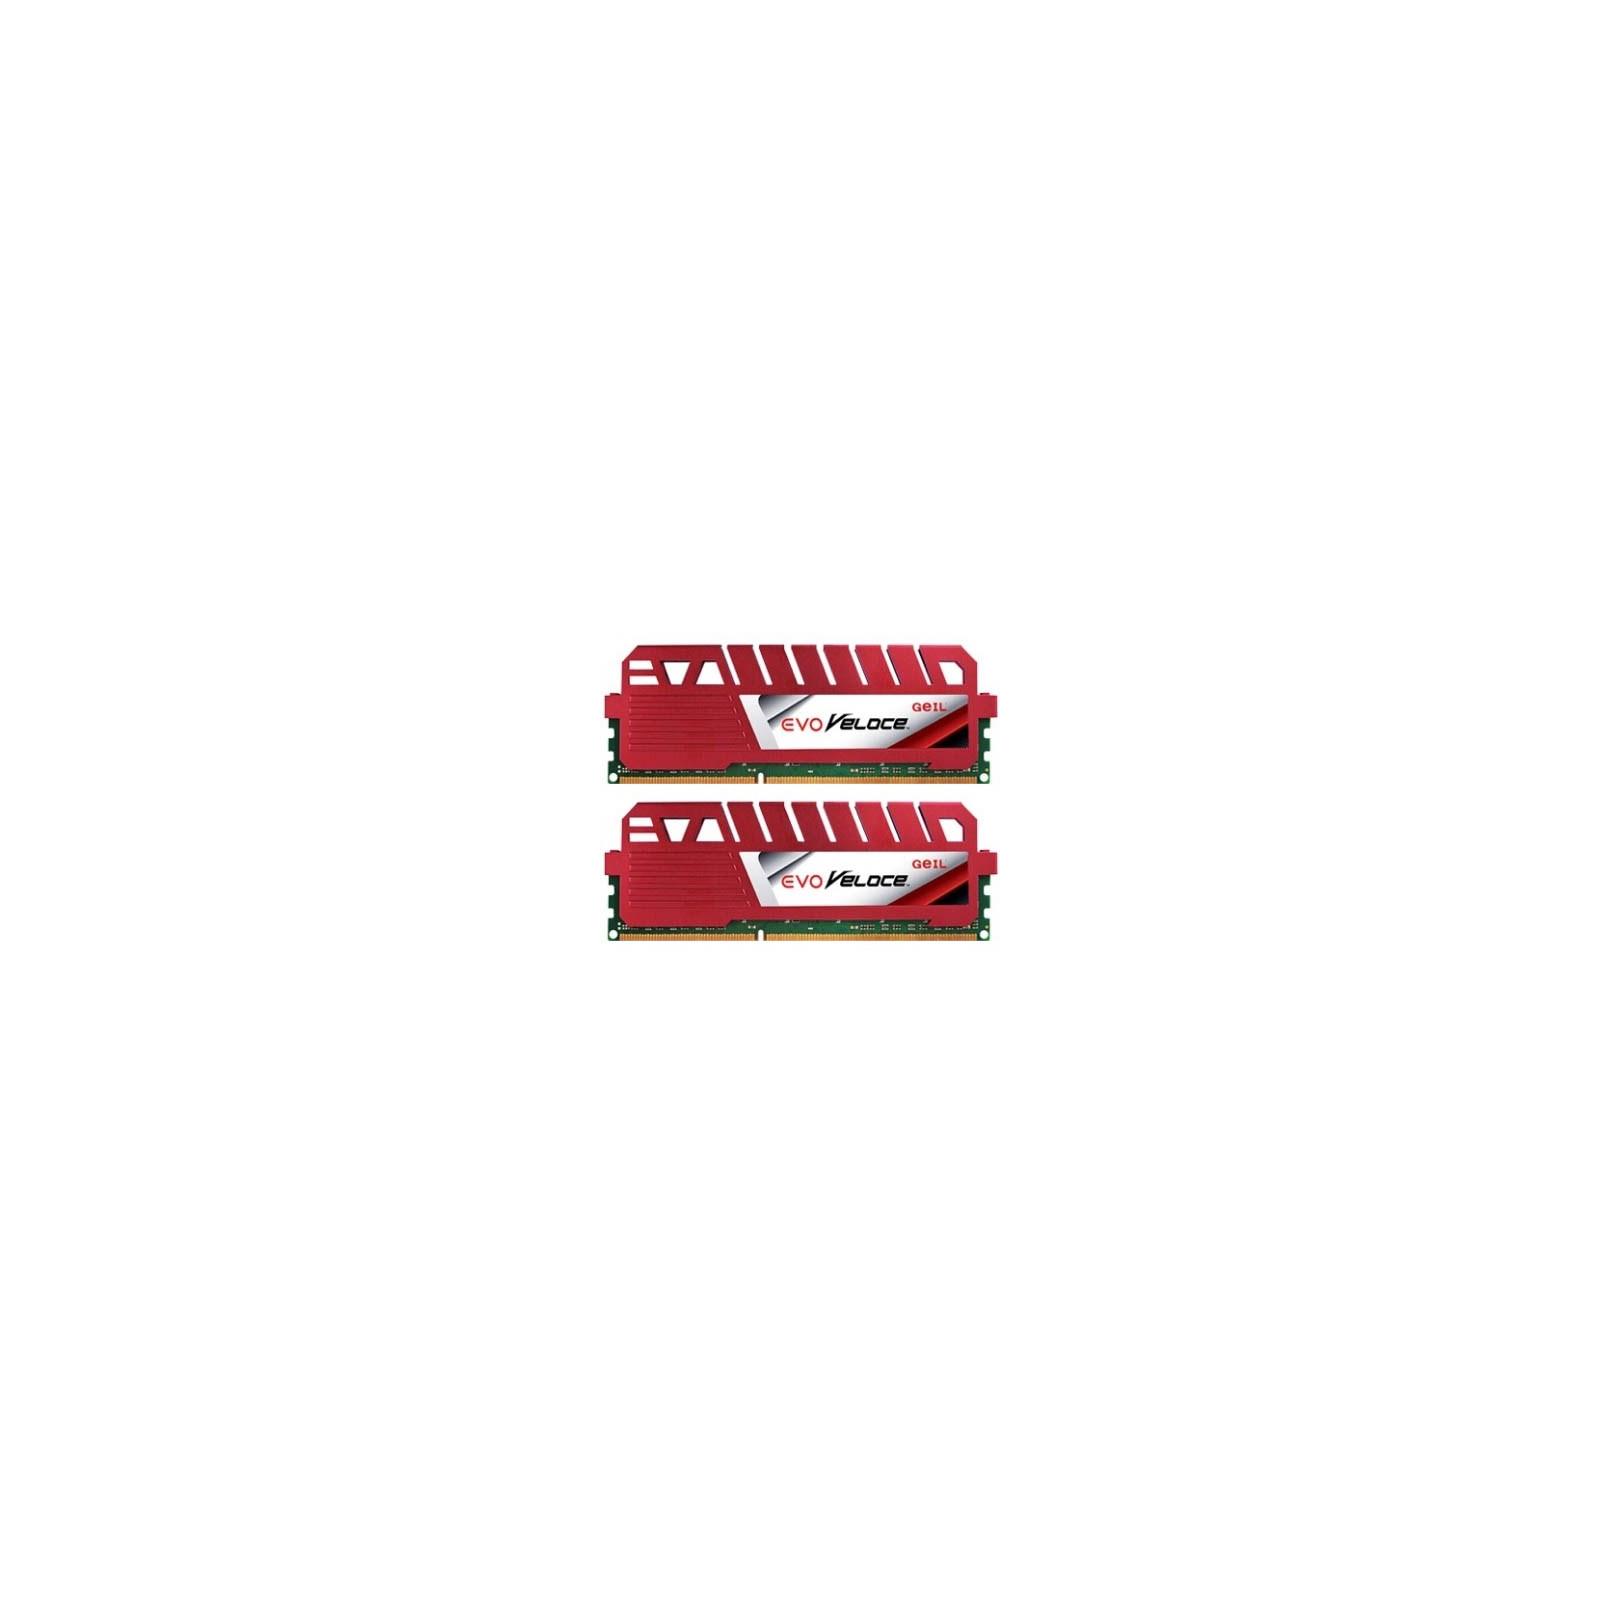 Модуль памяти для компьютера DDR3 16GB (4x4GB) 2133 MHz GEIL (GEV316GB2133C11QC)